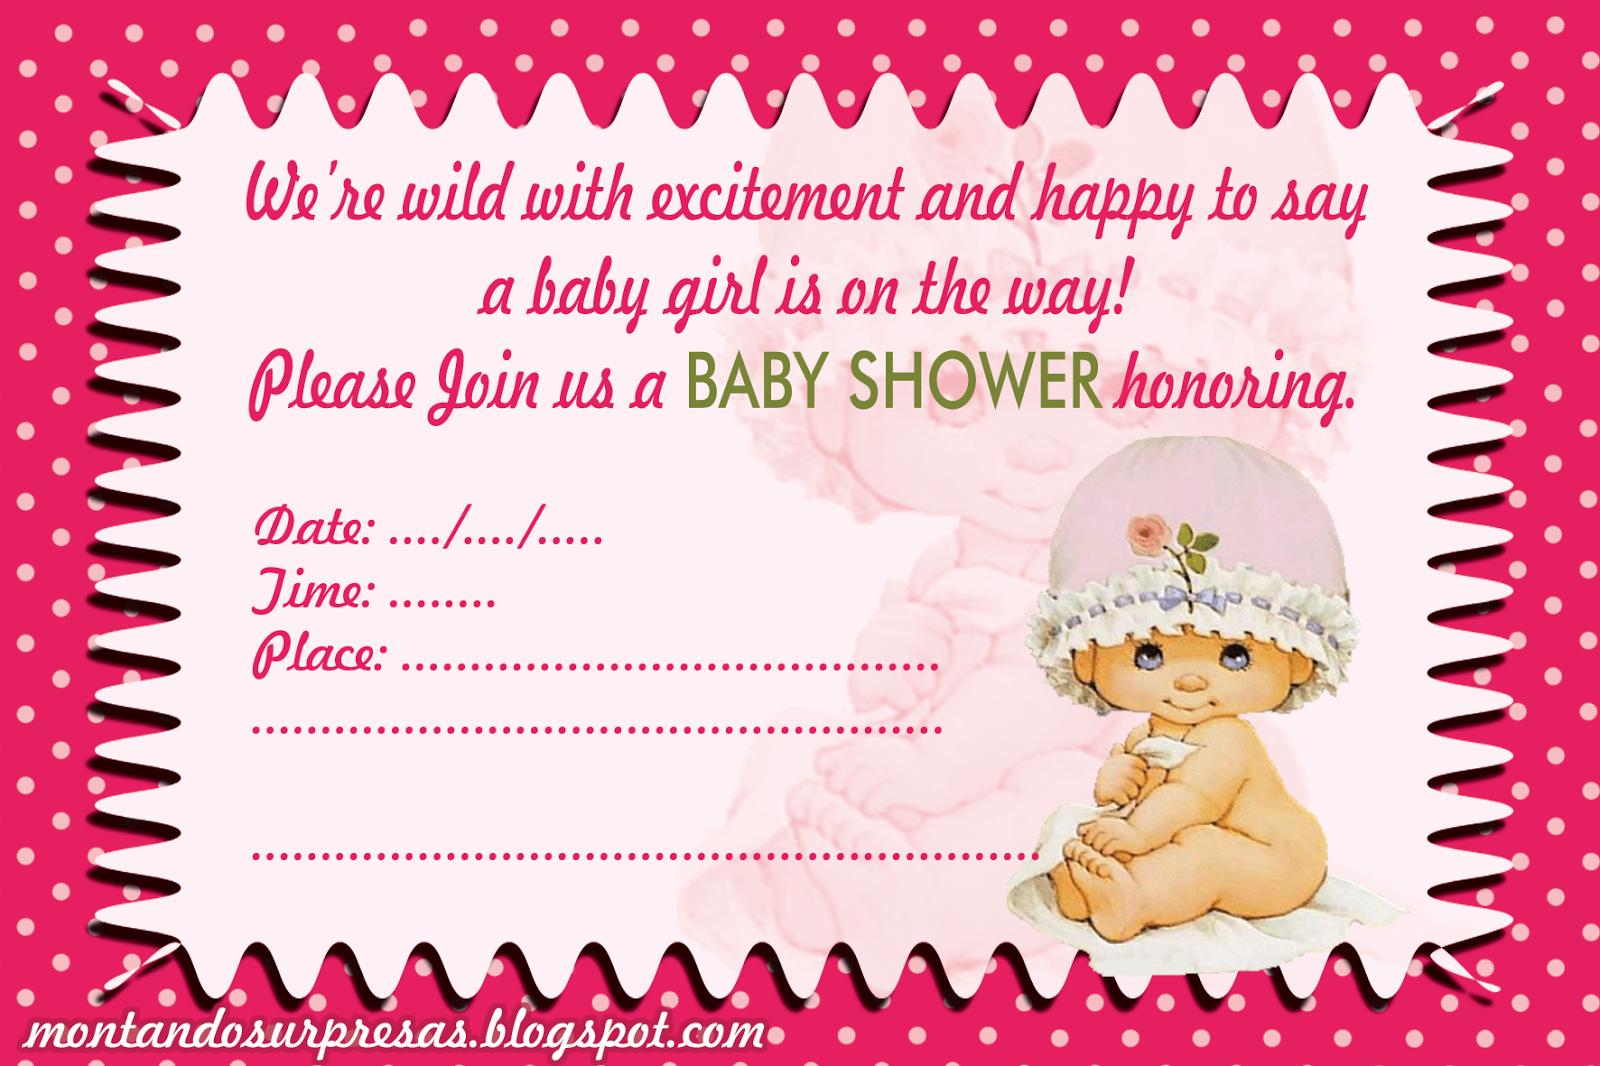 Montando Surpresas: Baby Shower invite to download free